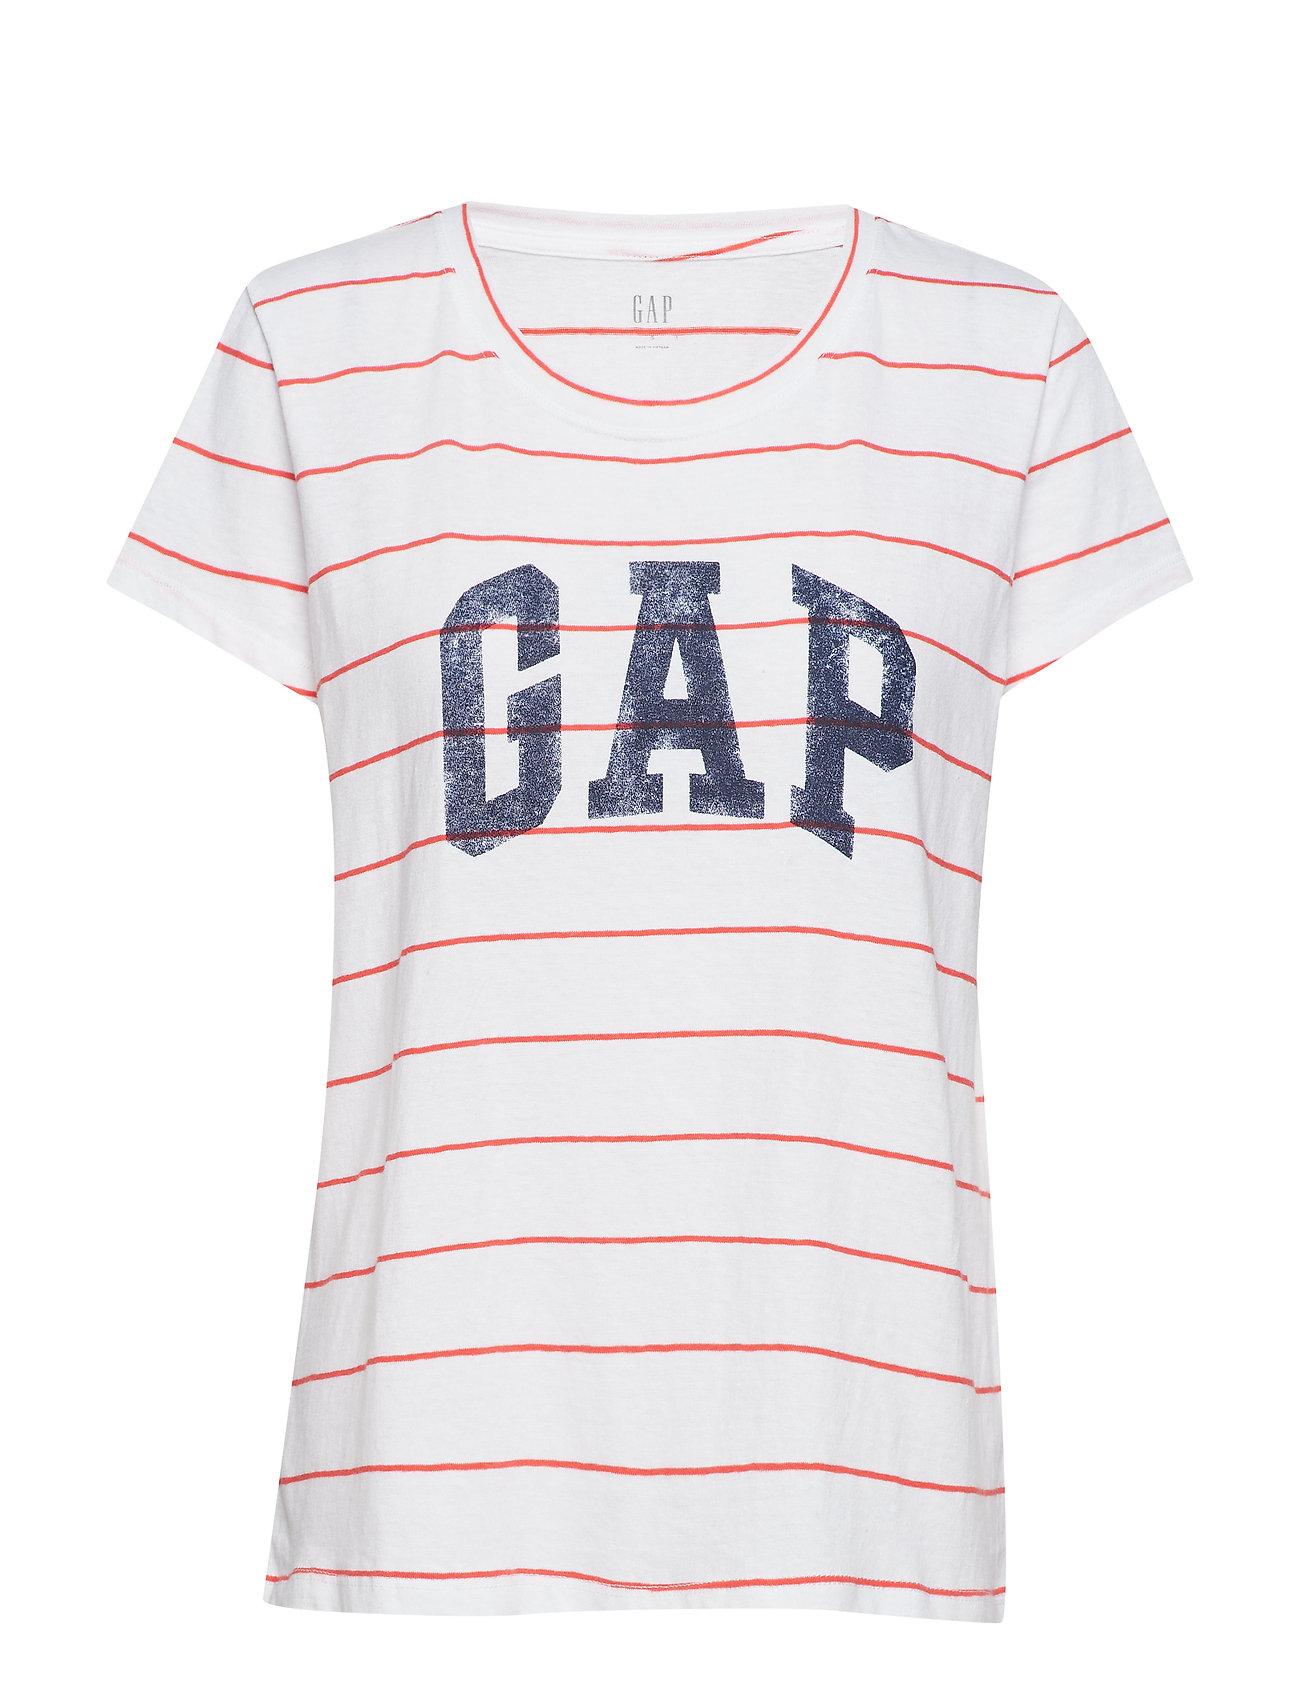 Stripe Ss Gap Teered Gap Str QrChdst